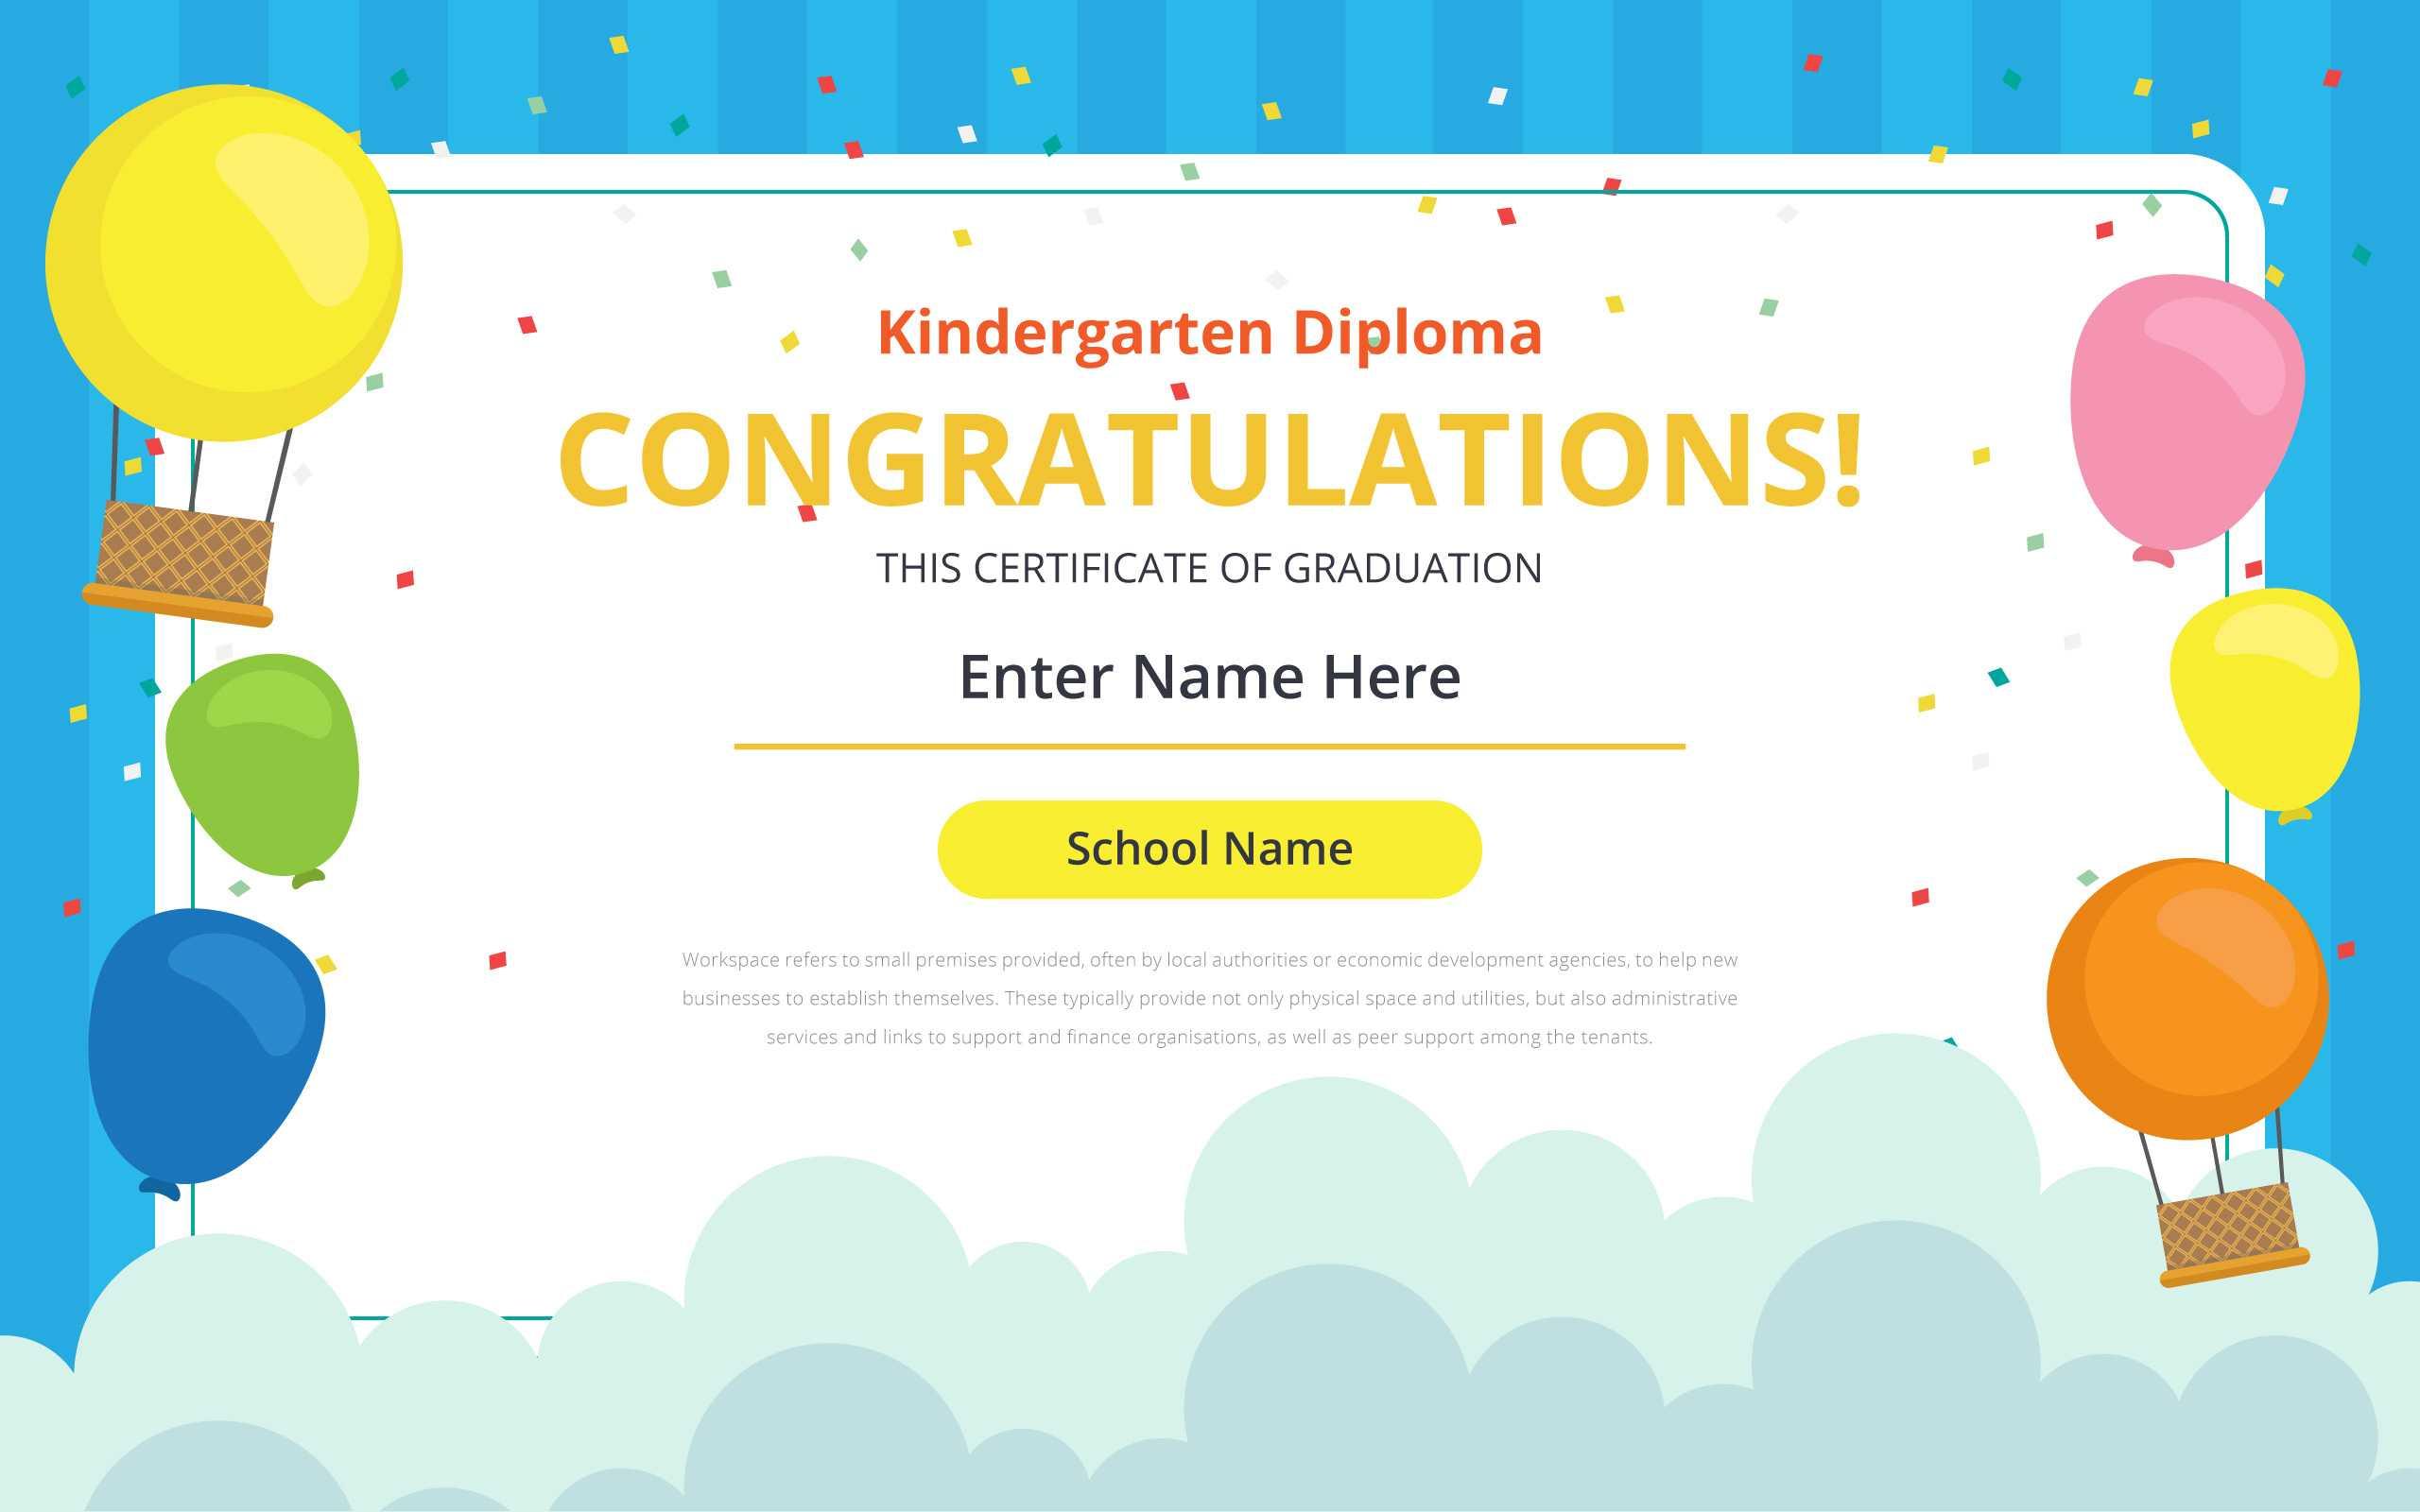 Kindergarten Certificate Free Vector Art – (32 Free Downloads) Intended For Preschool Graduation Certificate Template Free